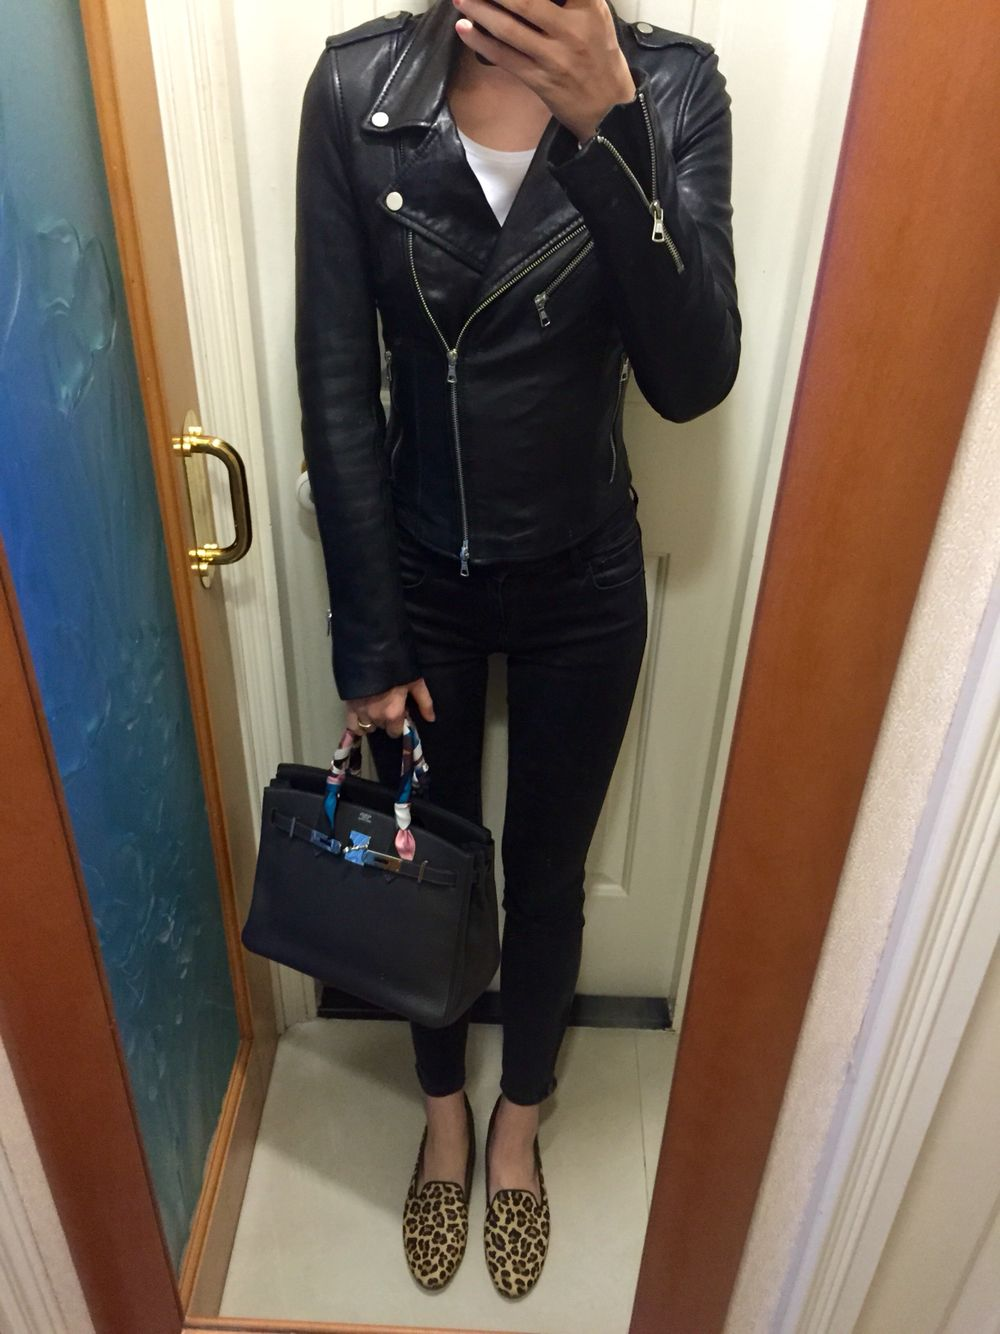 Zara leather biker jacket, H&M white tee, UNIQLO skinny